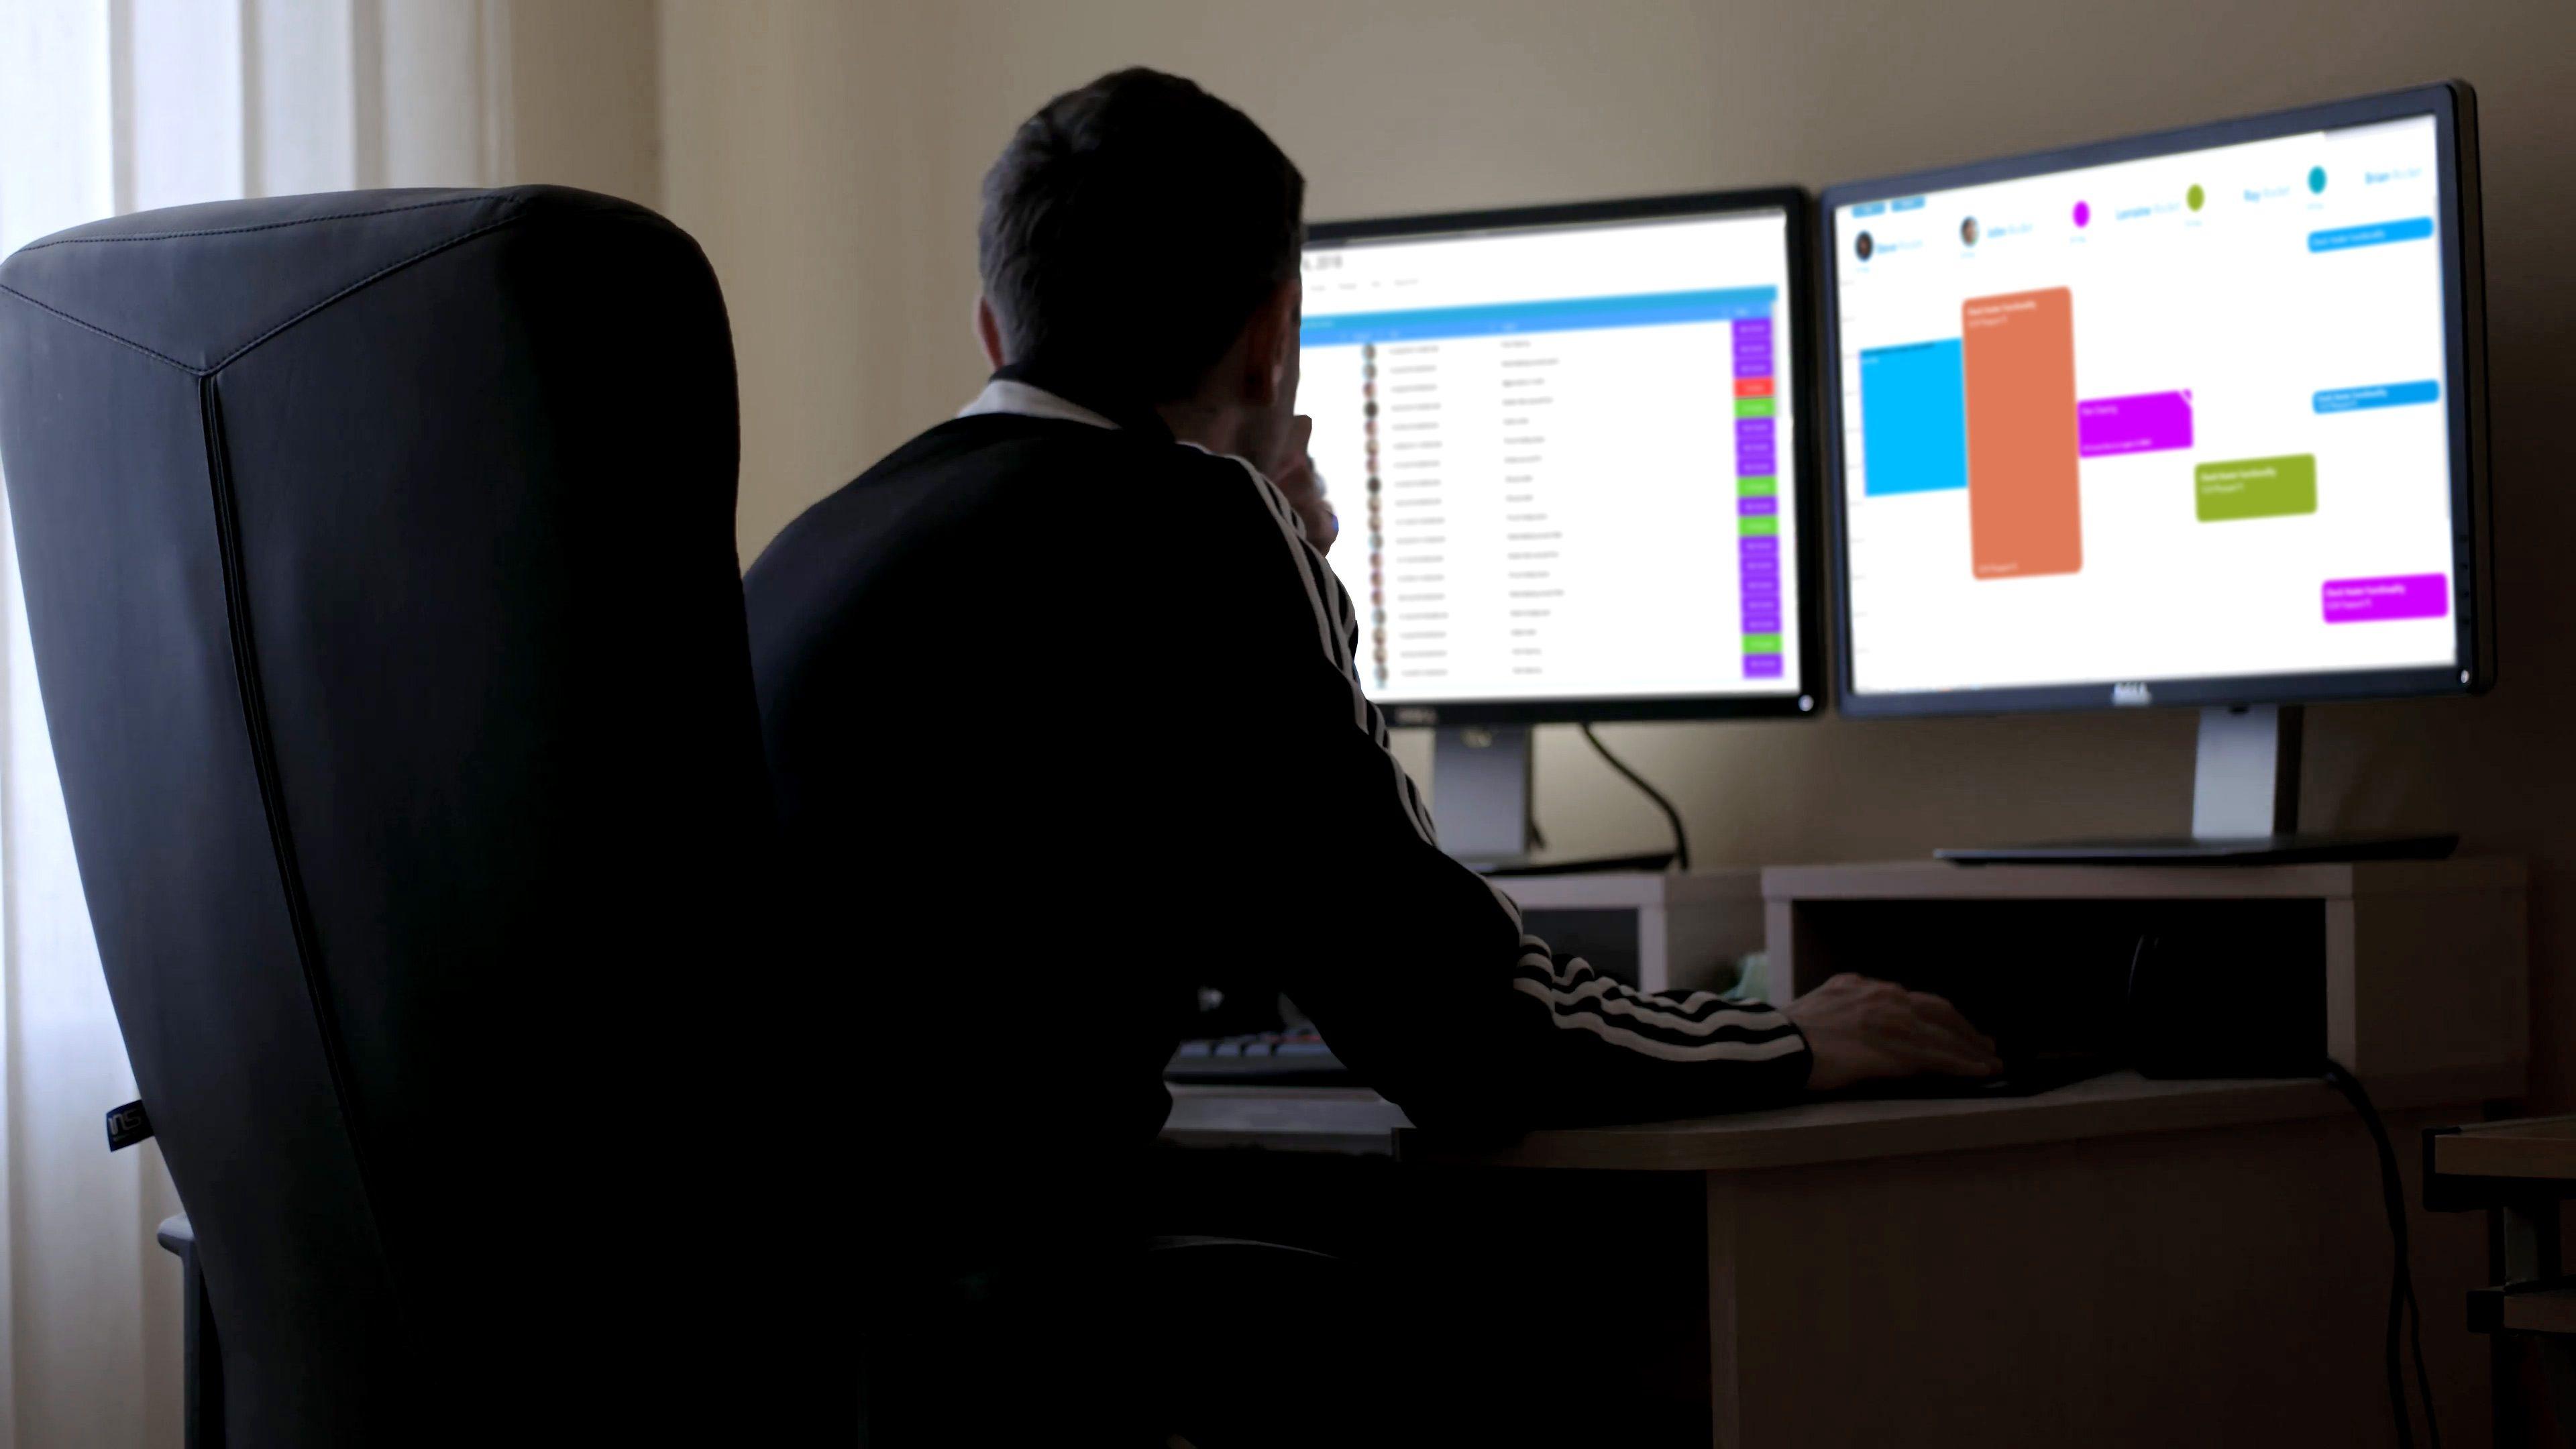 Wise Software - Enterprise schedule management